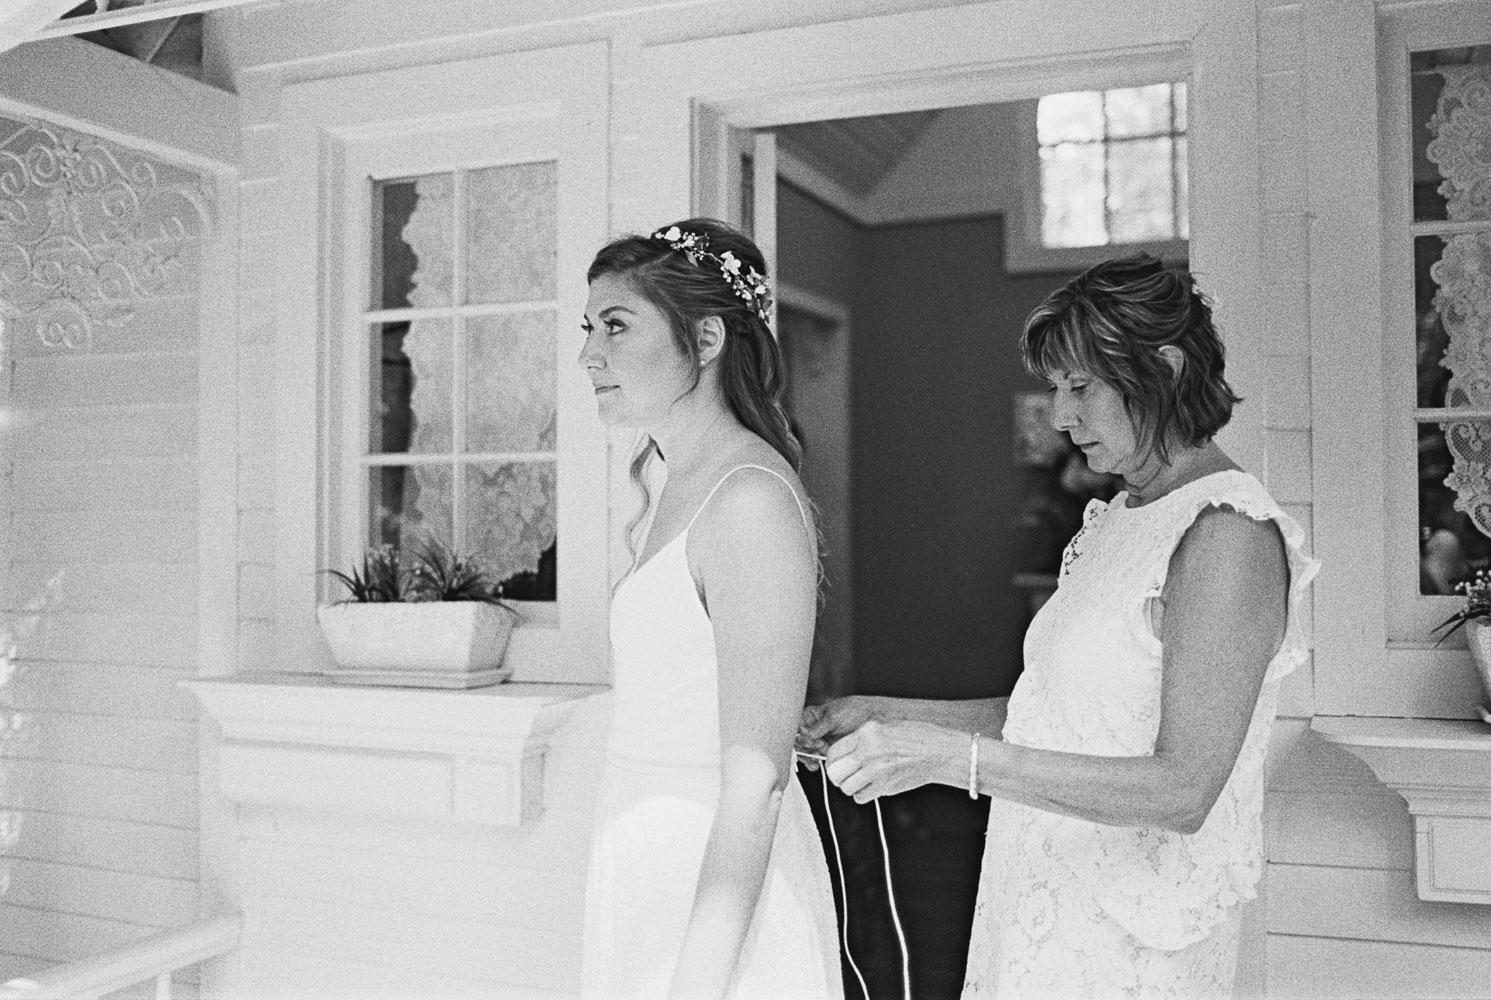 Mom ties bride's dress at Wellspring Spa Wedding Venue near Seattle